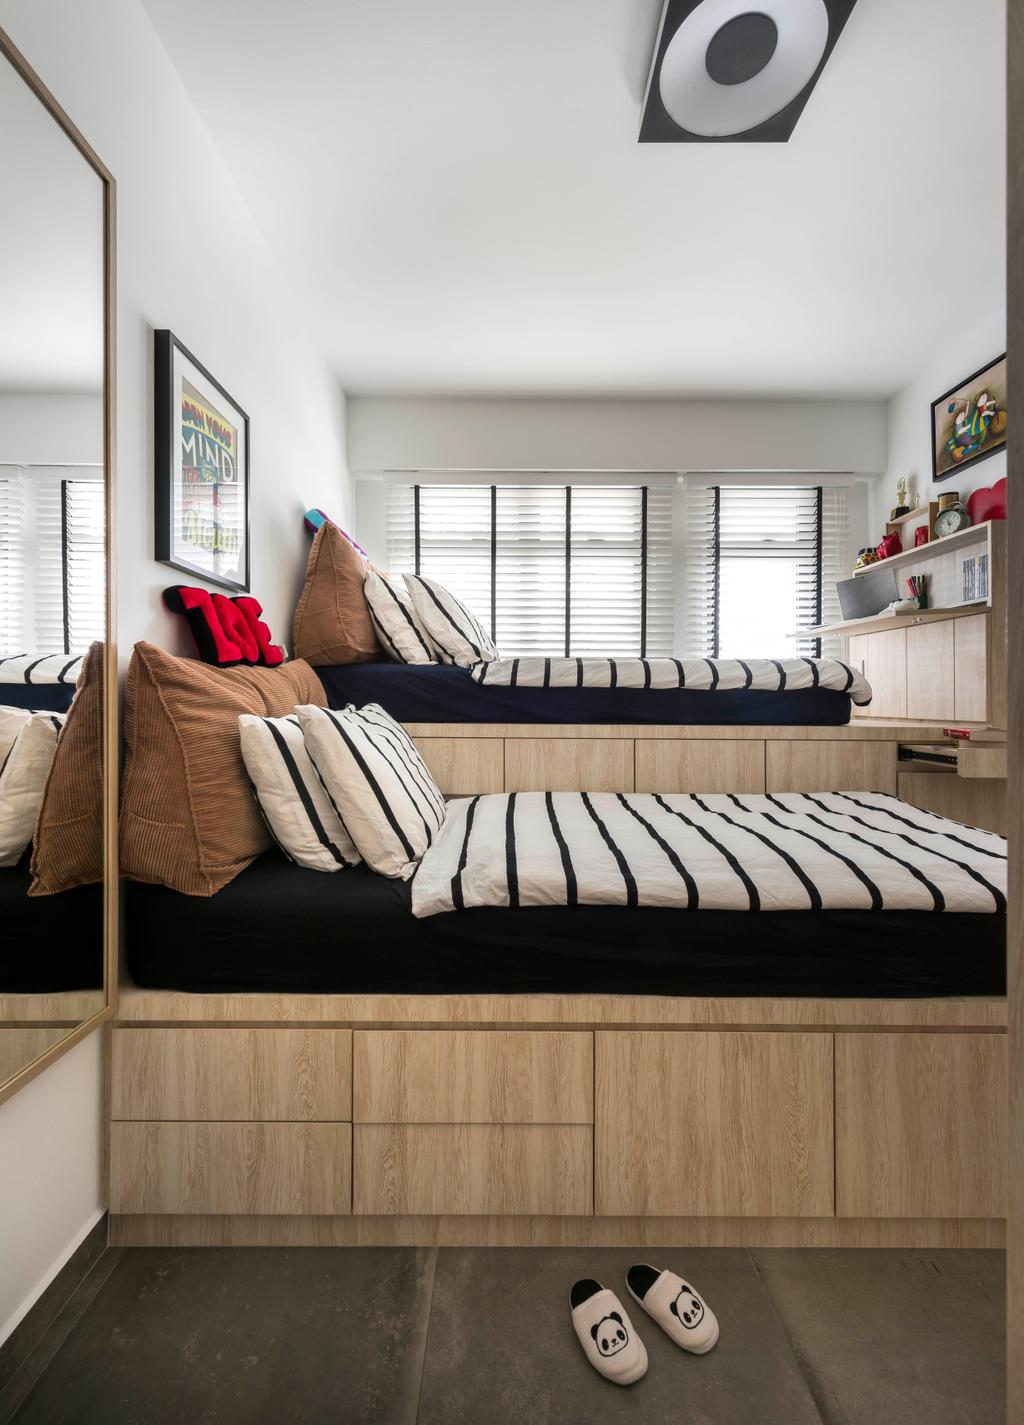 Image Of 2 Bedroom Felix Hdb: Interior Design Singapore